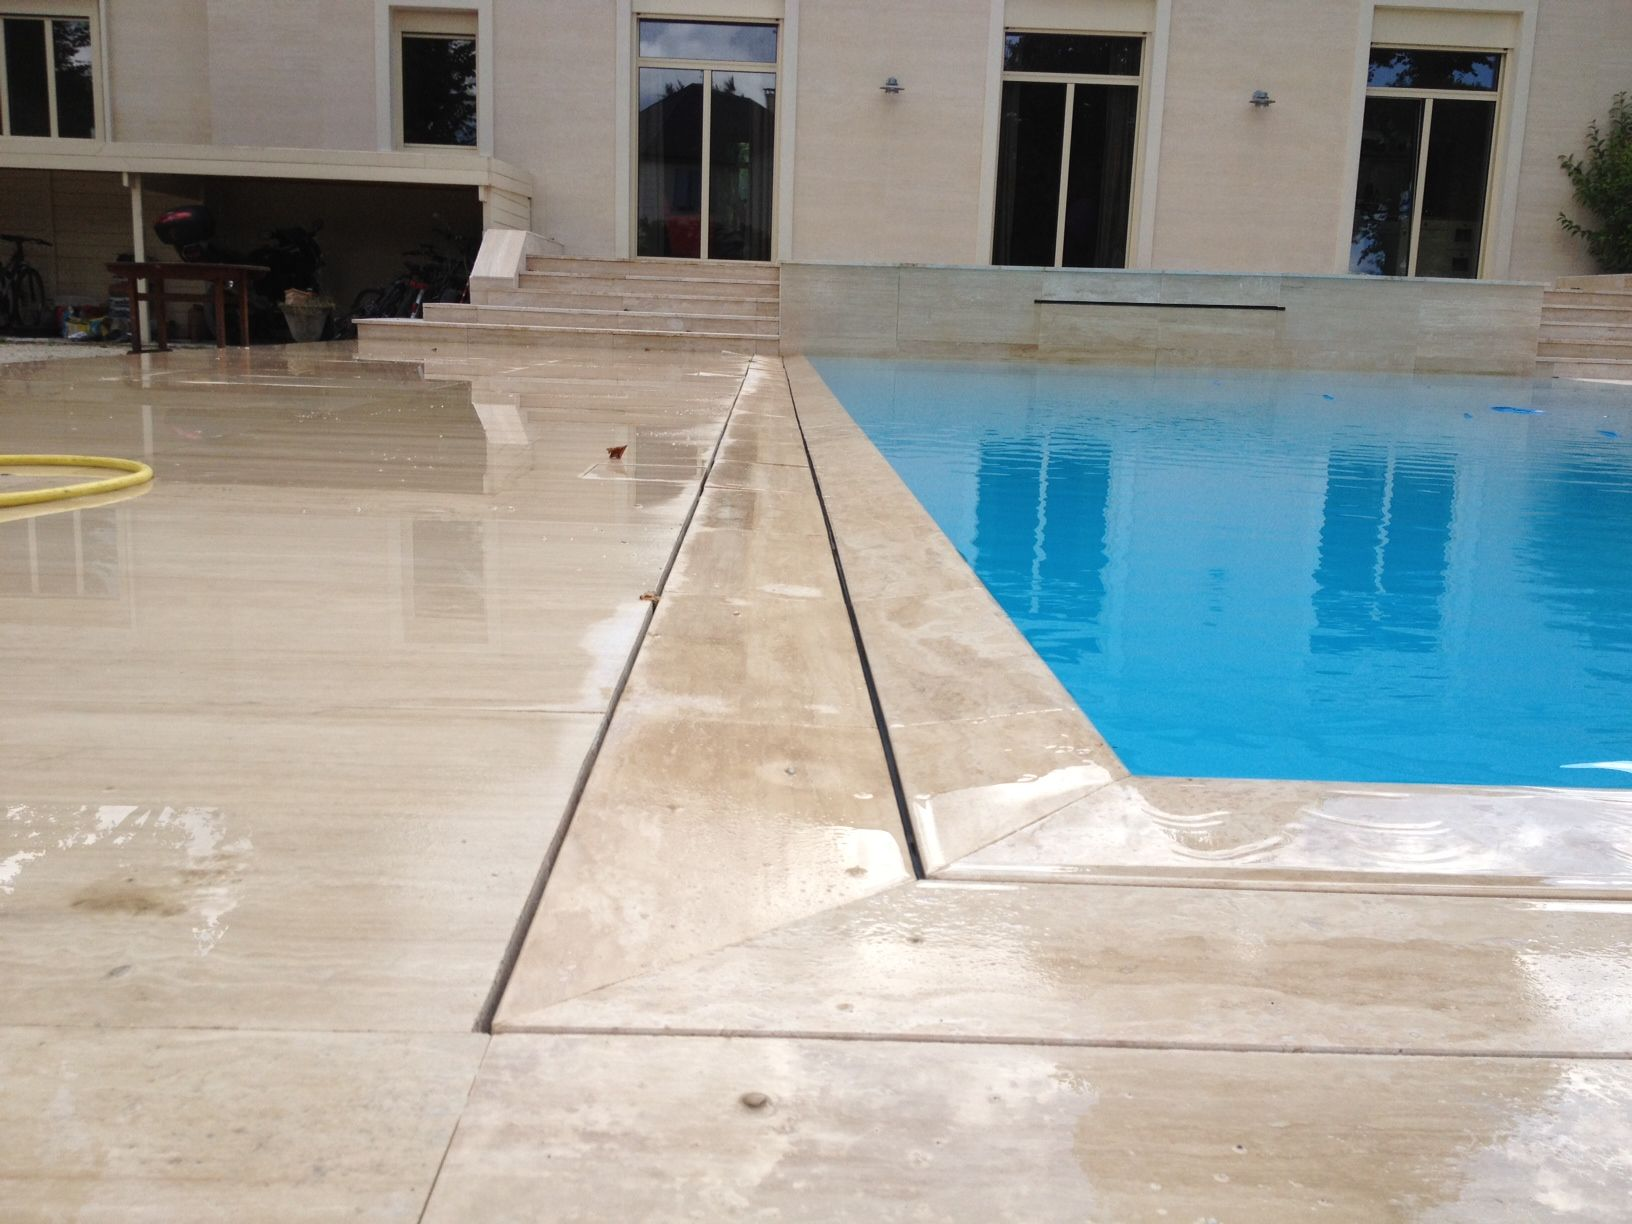 piscine miroir en b ton avec terrasses en travertin conception et r alisation par terra ga. Black Bedroom Furniture Sets. Home Design Ideas